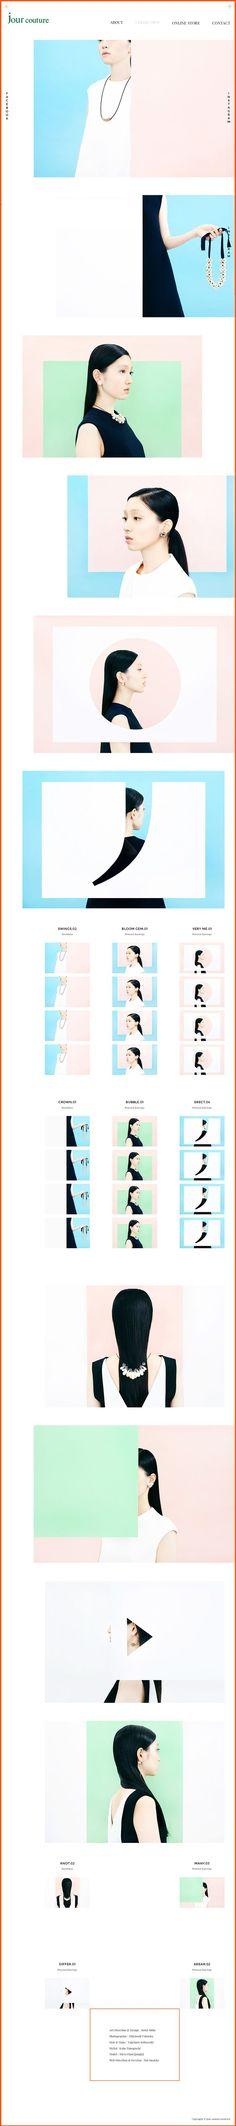 "<a href=""http://jour-couture.jp"" rel=""nofollow"" target=""_blank"">jour-couture.jp/</a>"